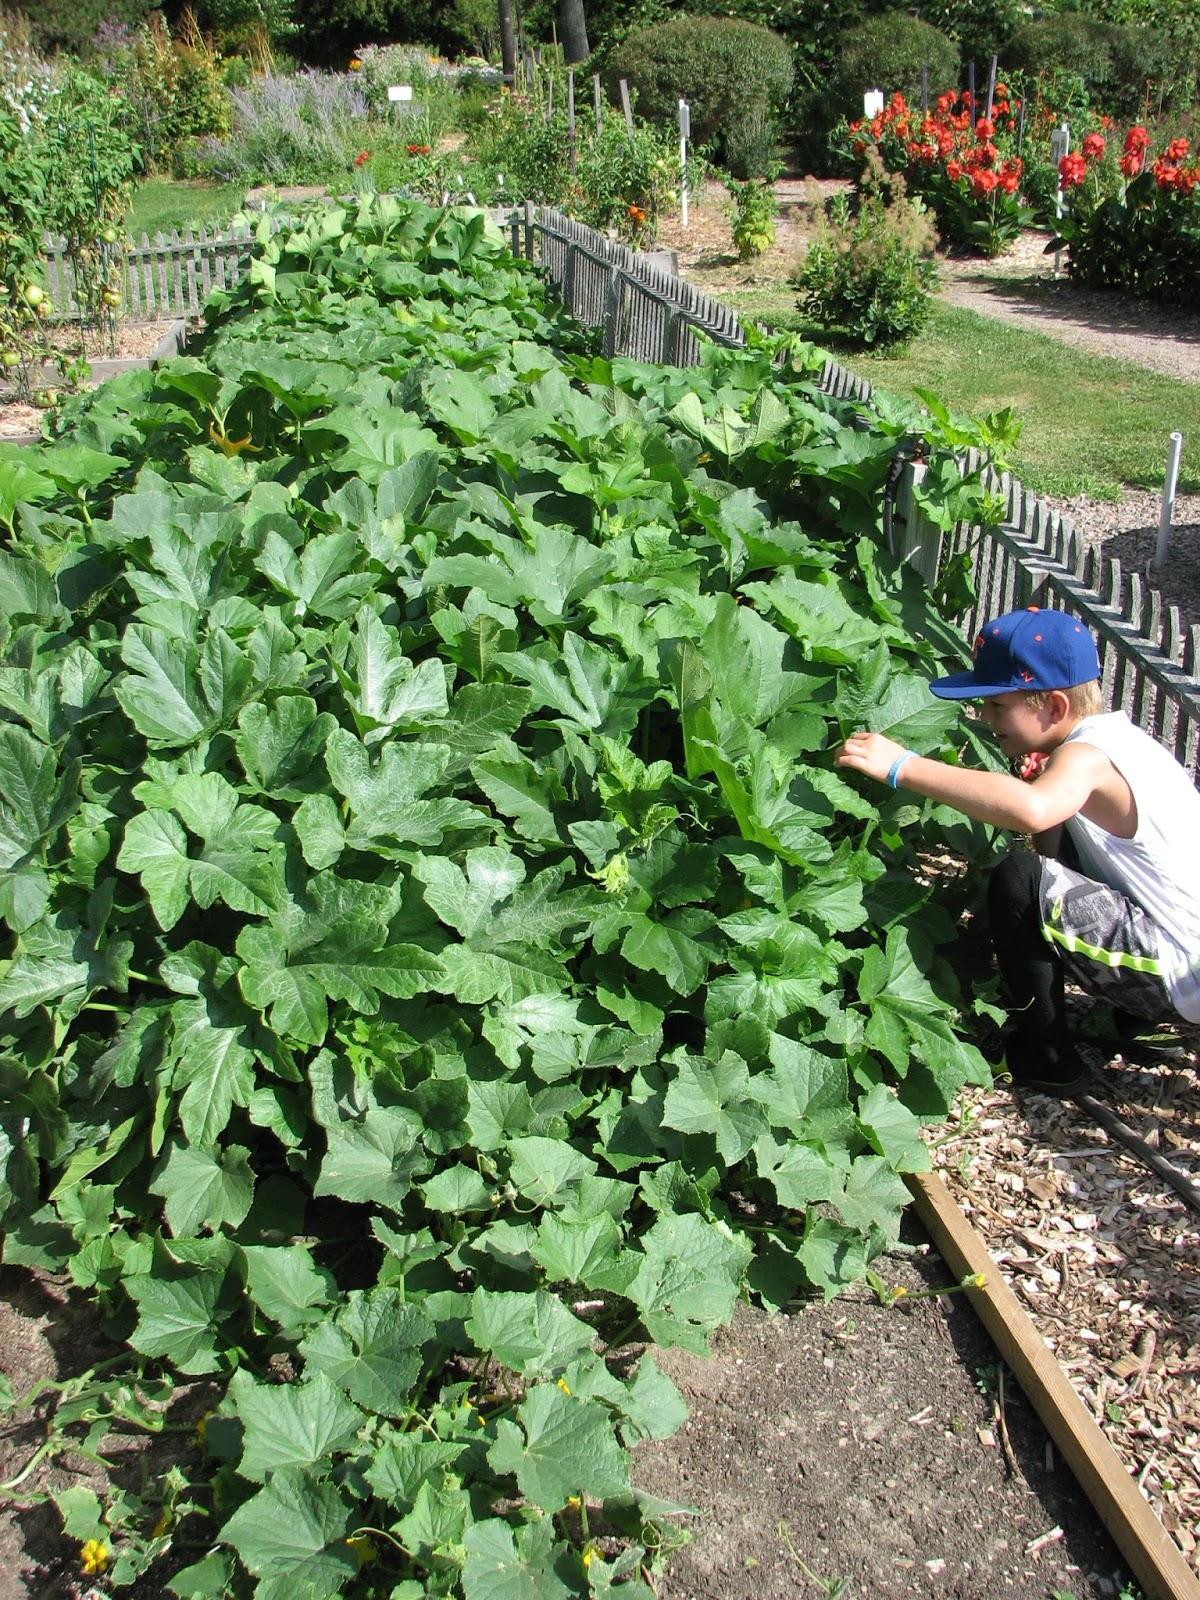 Growing young gardeners harvesting f u n south for The gardener burlington